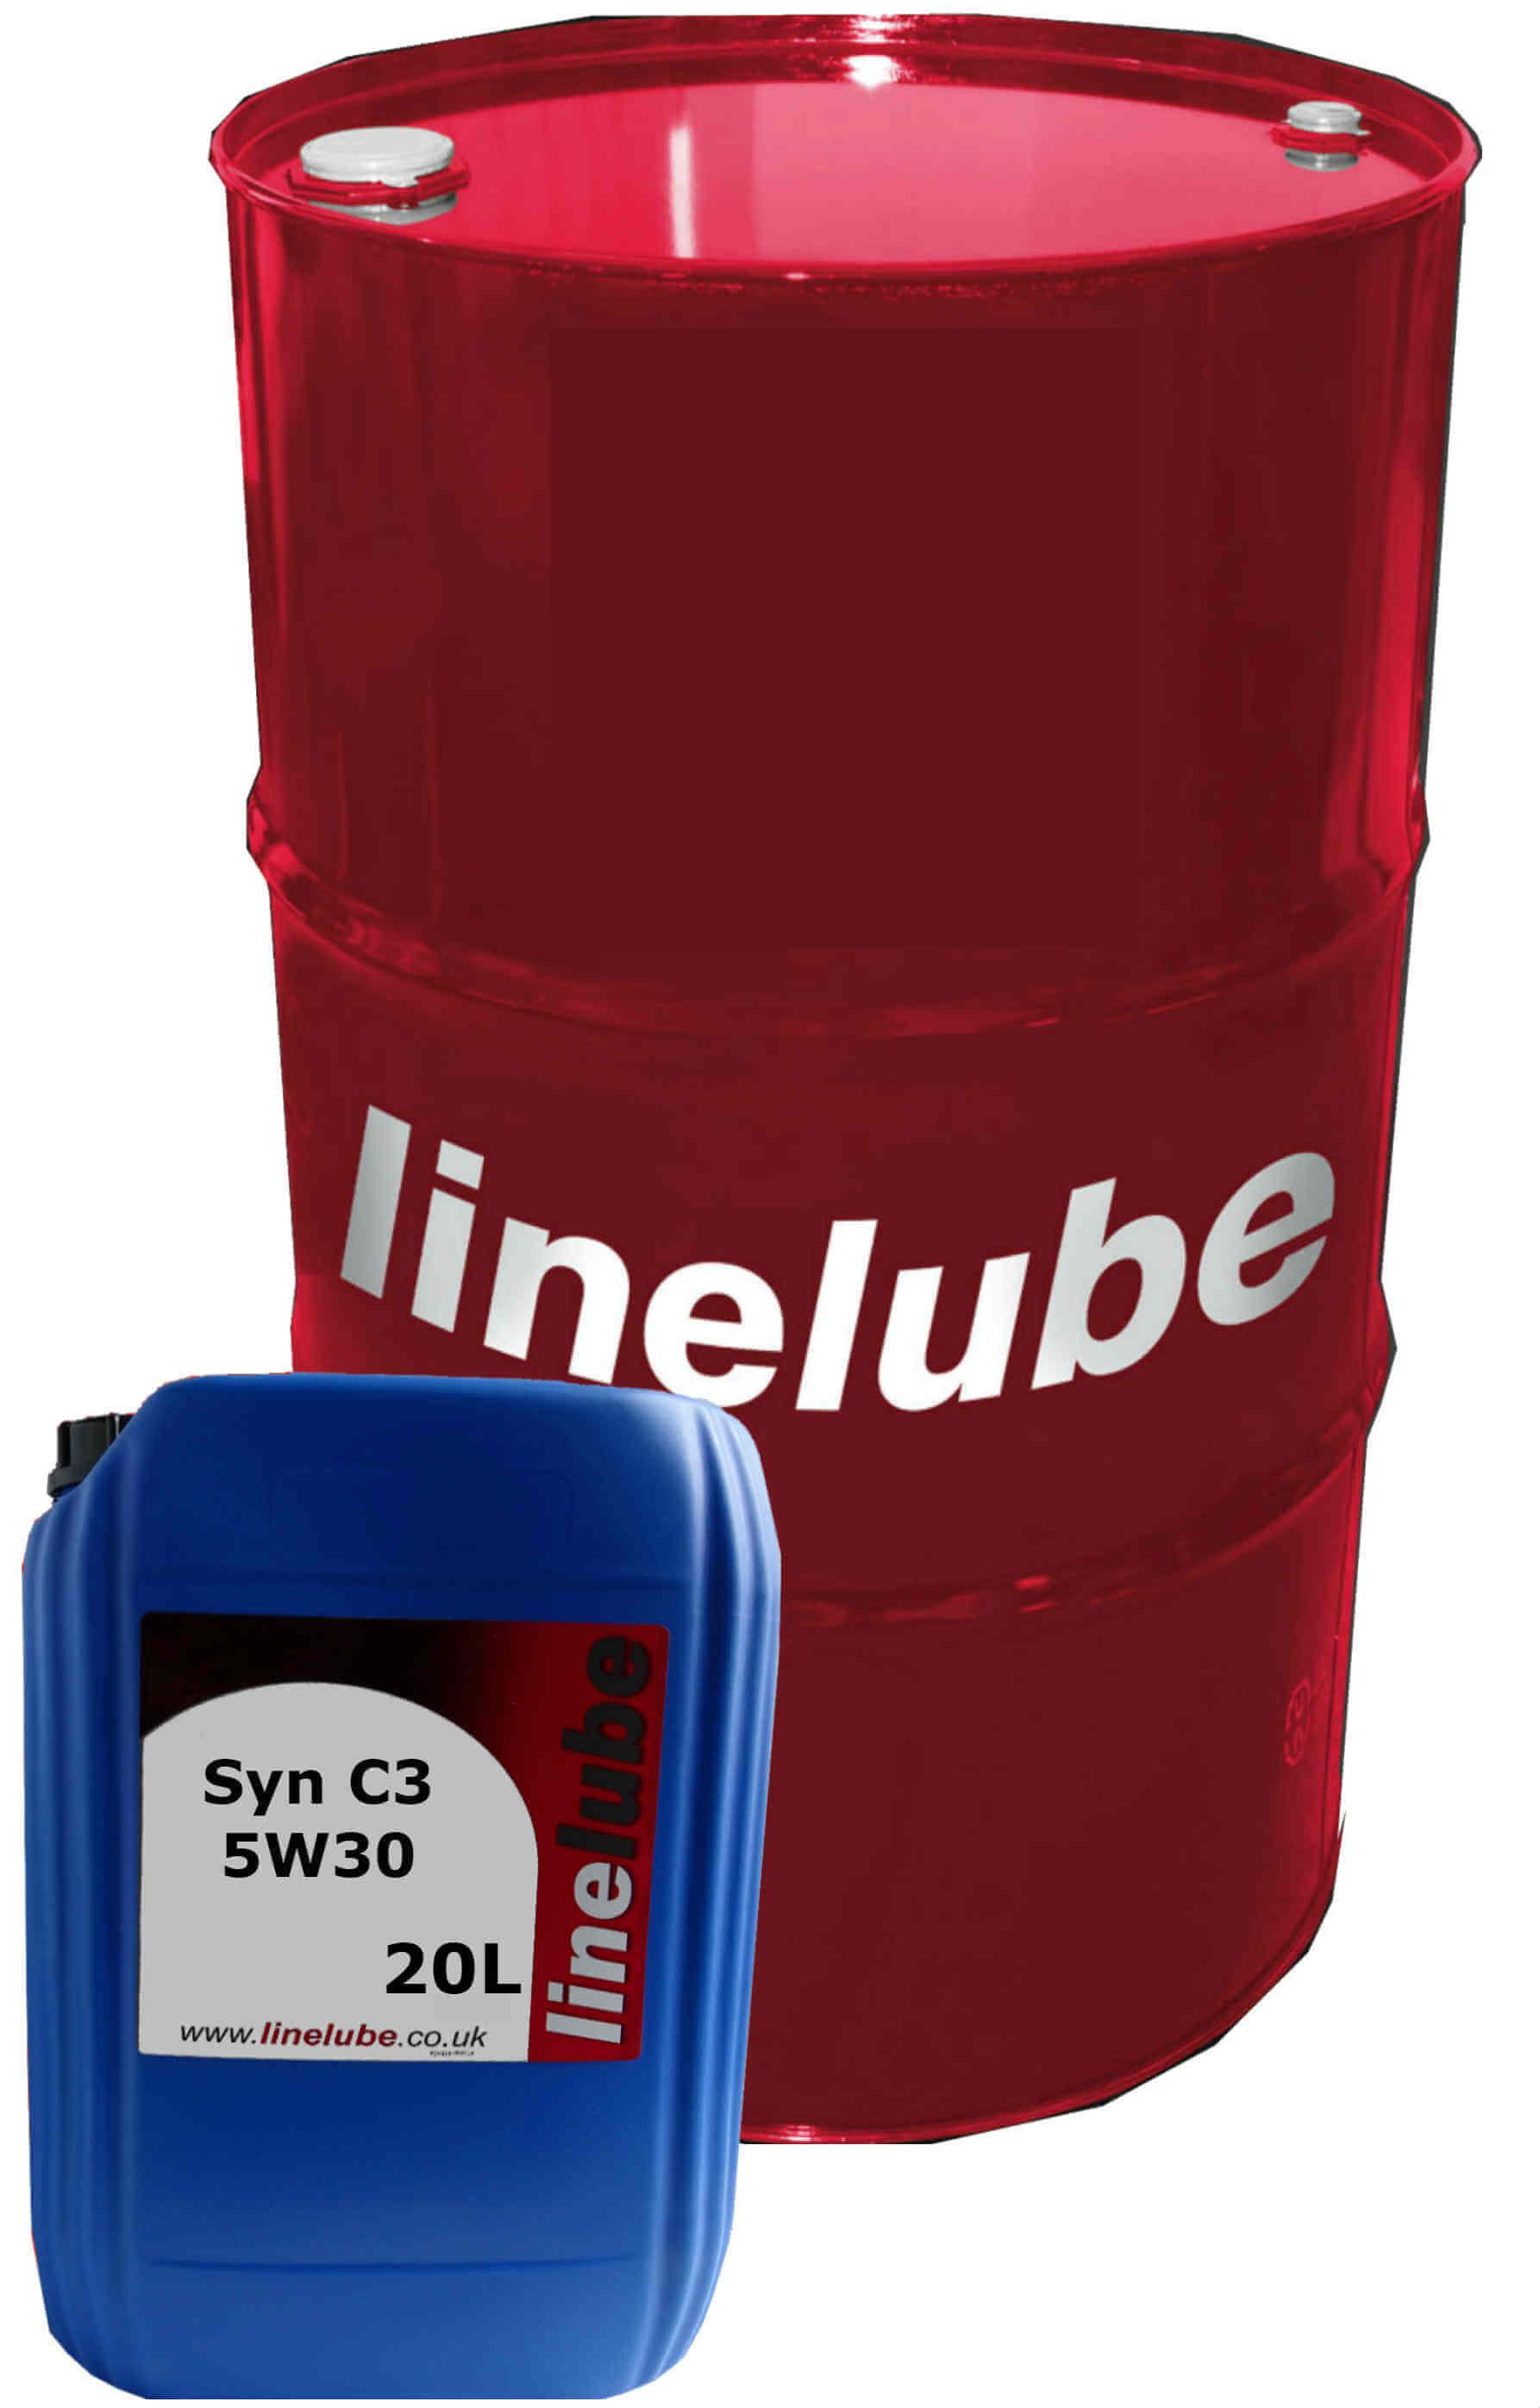 Linelube Syn C3 5w30